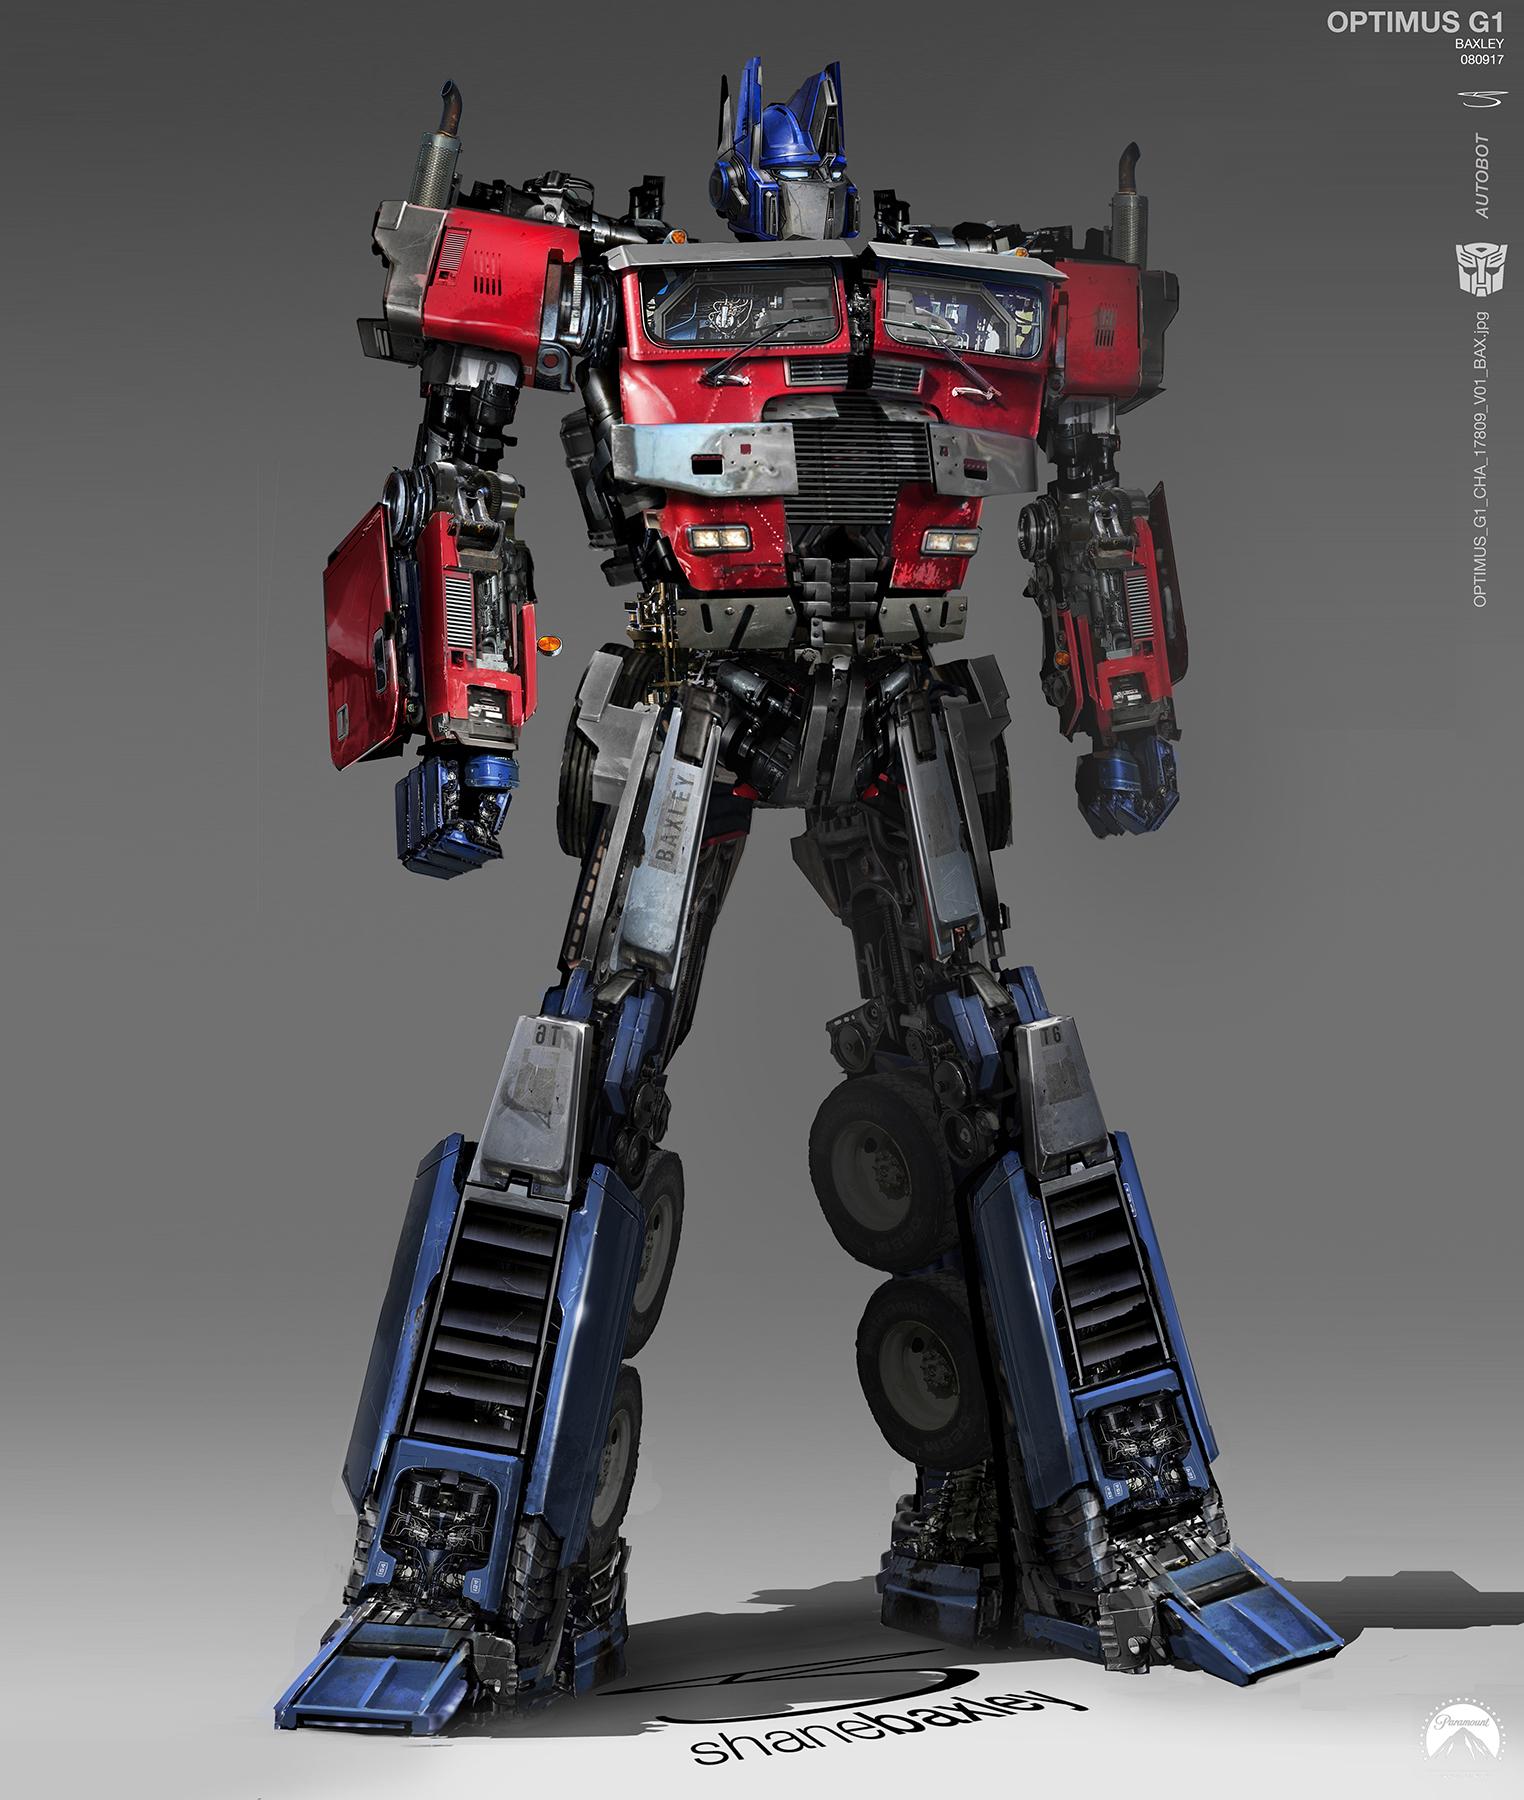 Transformers Bumblebee Movie Concept Art